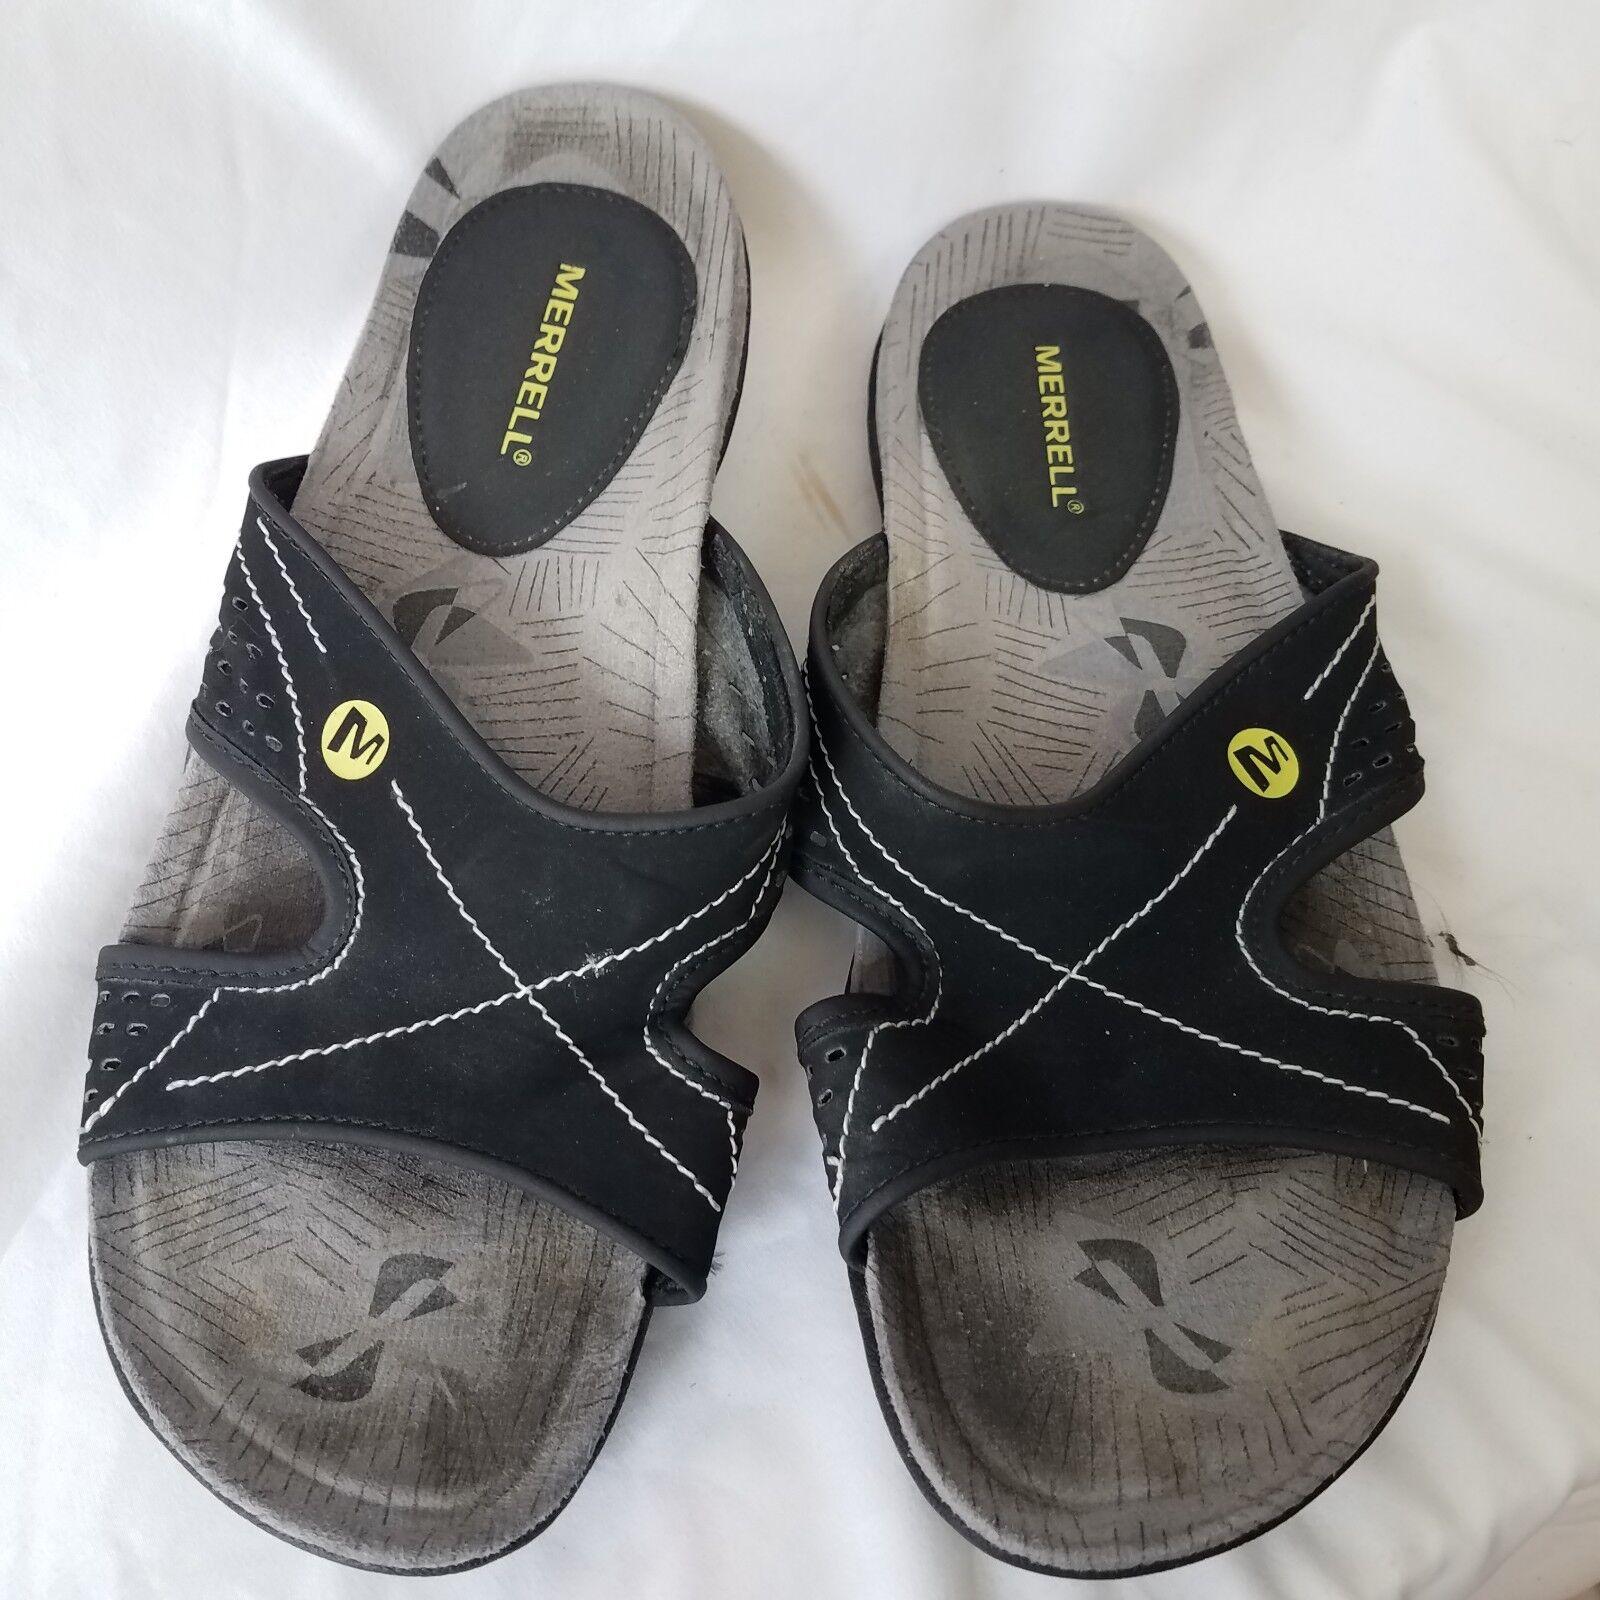 Merrell size 7 womens Lorelei Slide Black Sandals womens 7 56467f